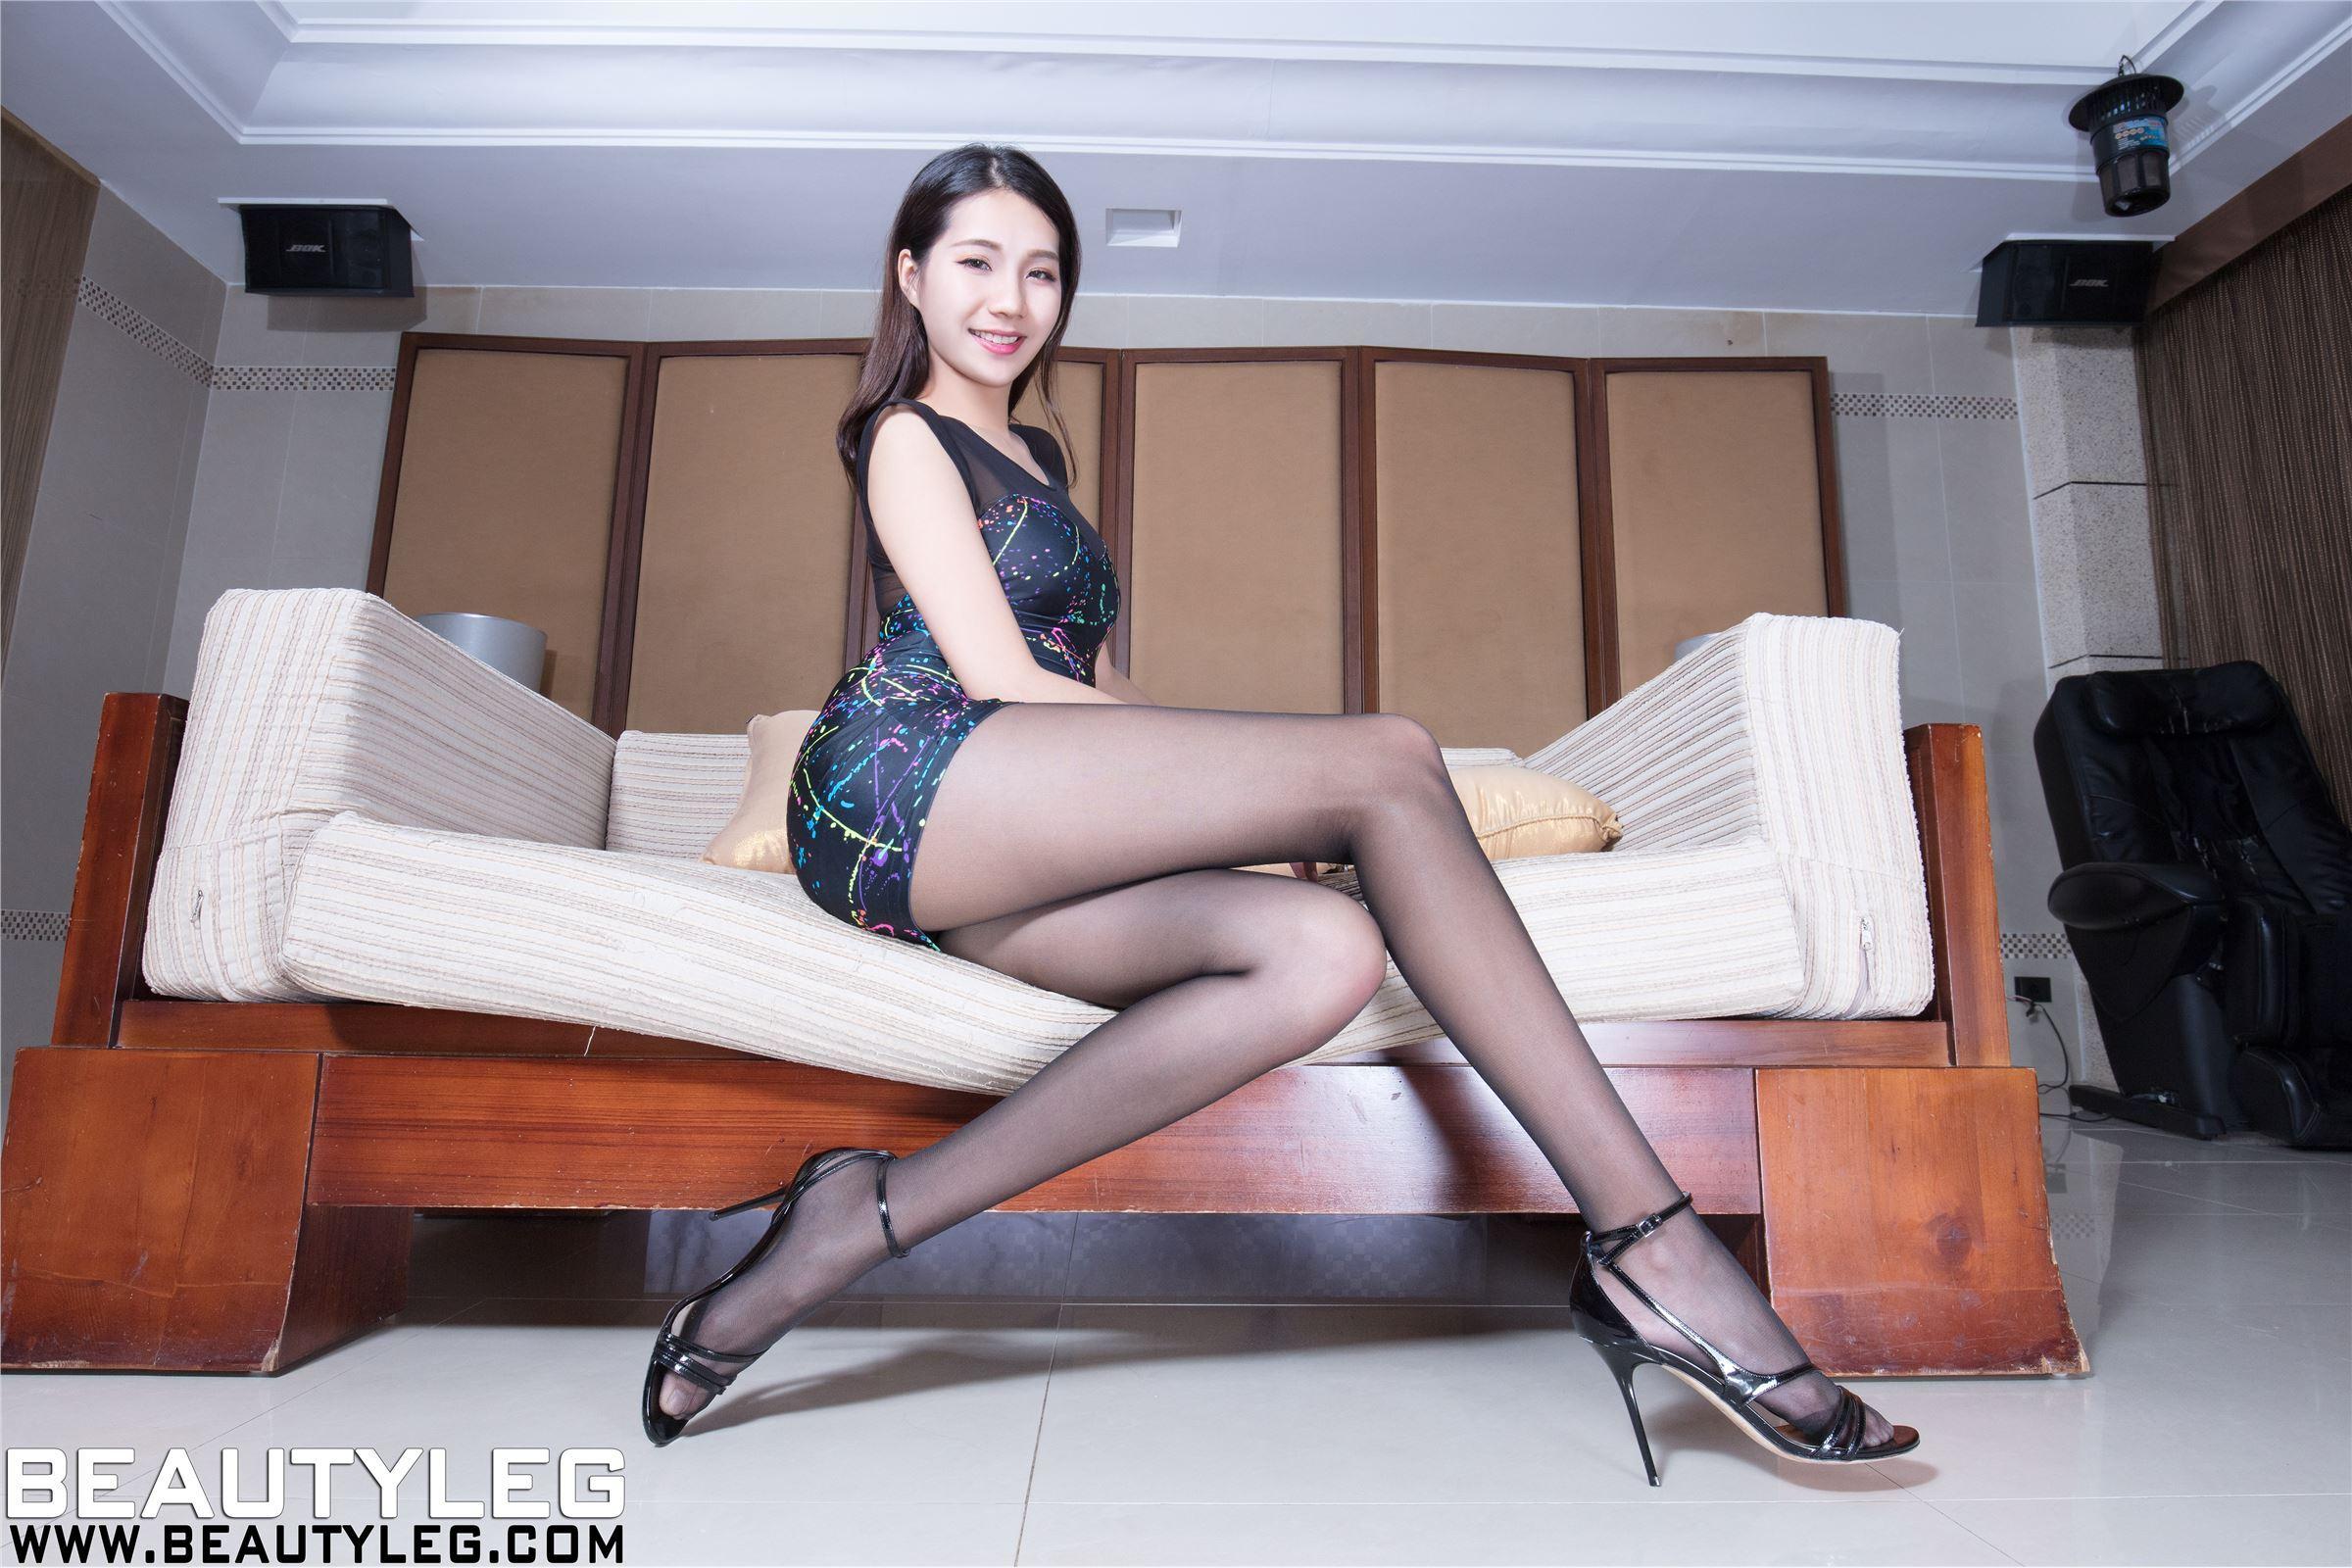 Beautyleg 2018.10.10 No.1669 Anita